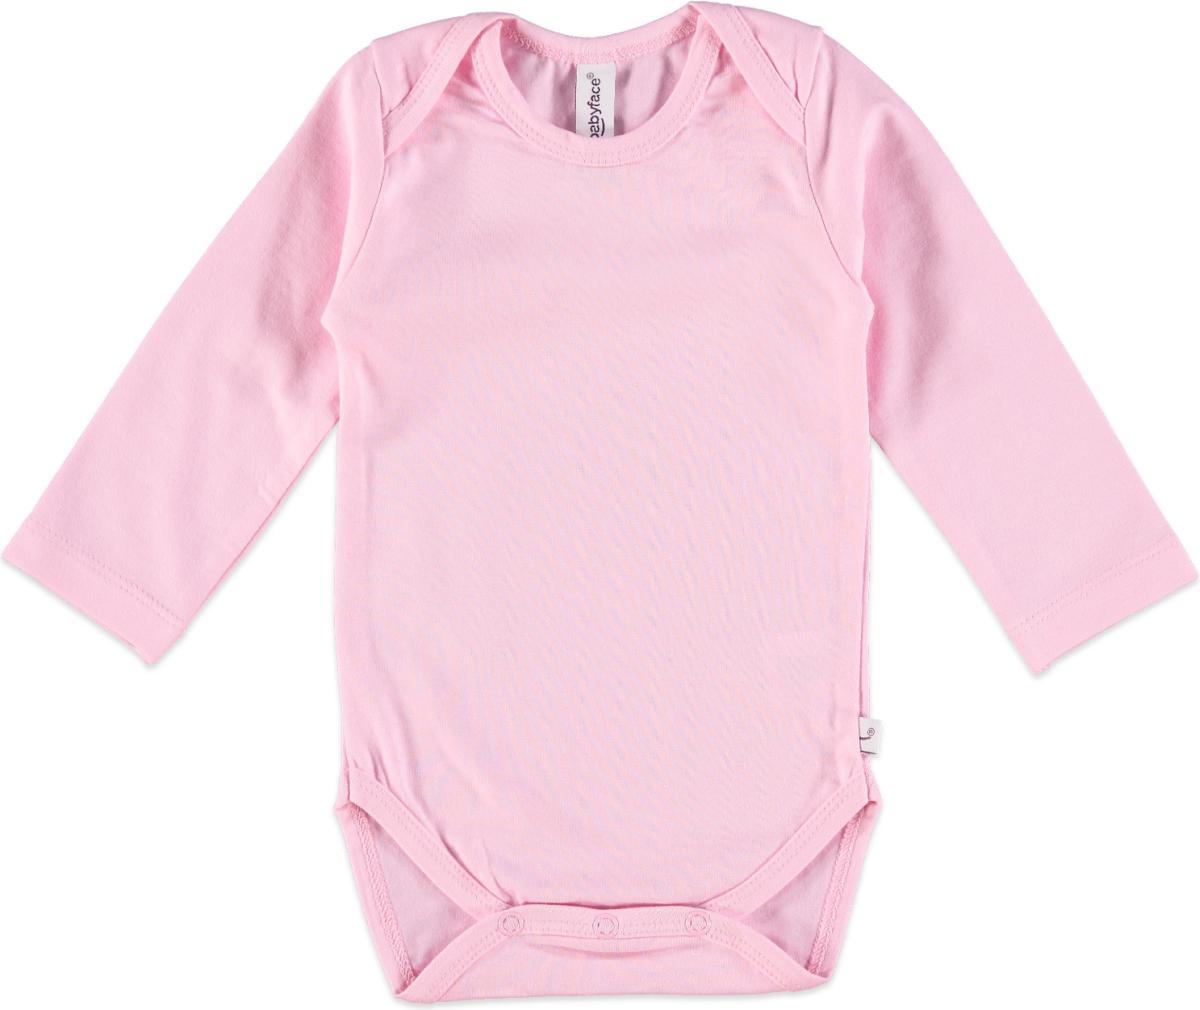 Babyface Unisexrompertje - Pink - Maat 62 / 68